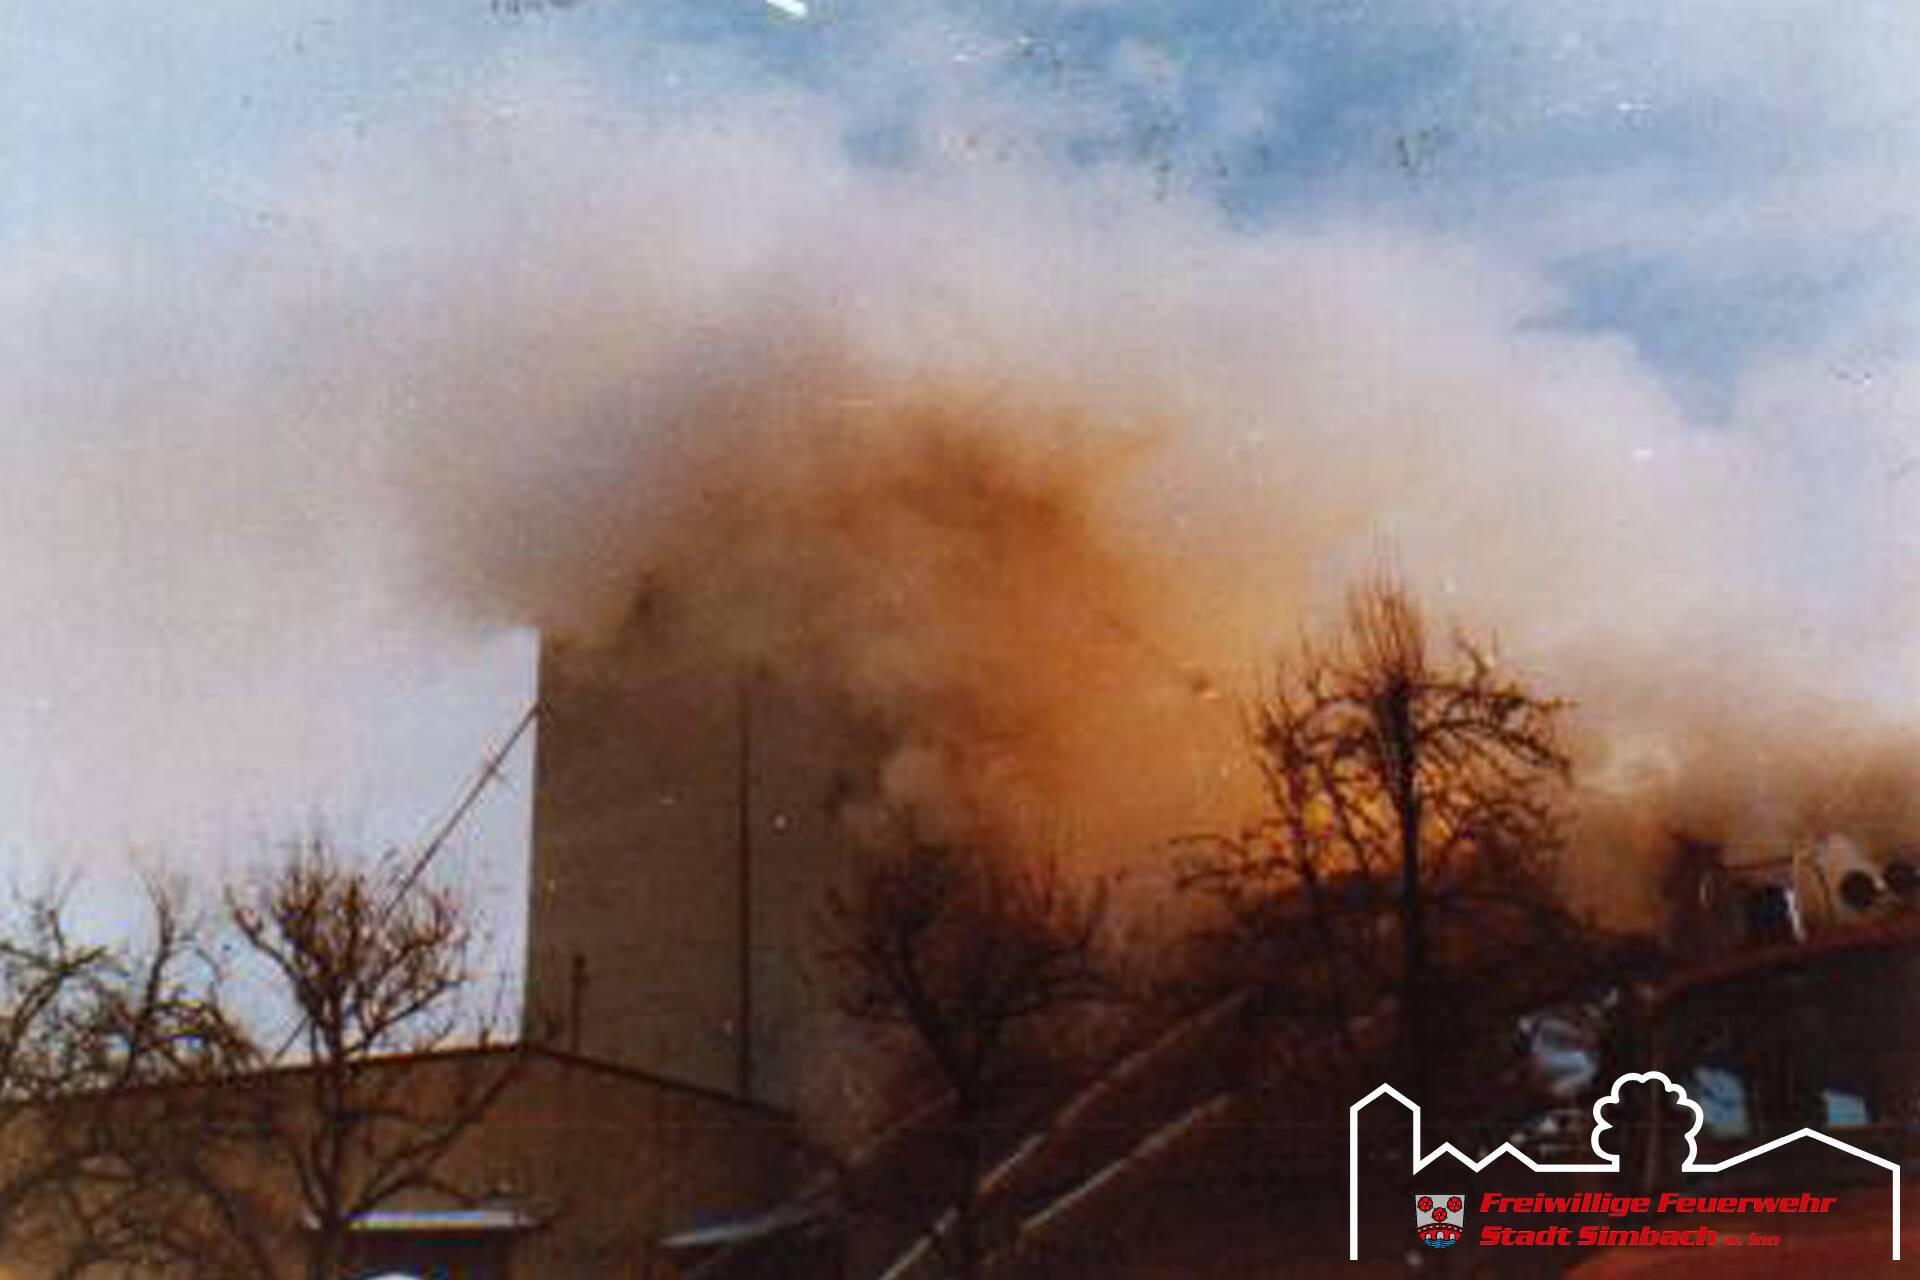 Brand Lagerhaus Oberlechner 12.12.1980 (6)